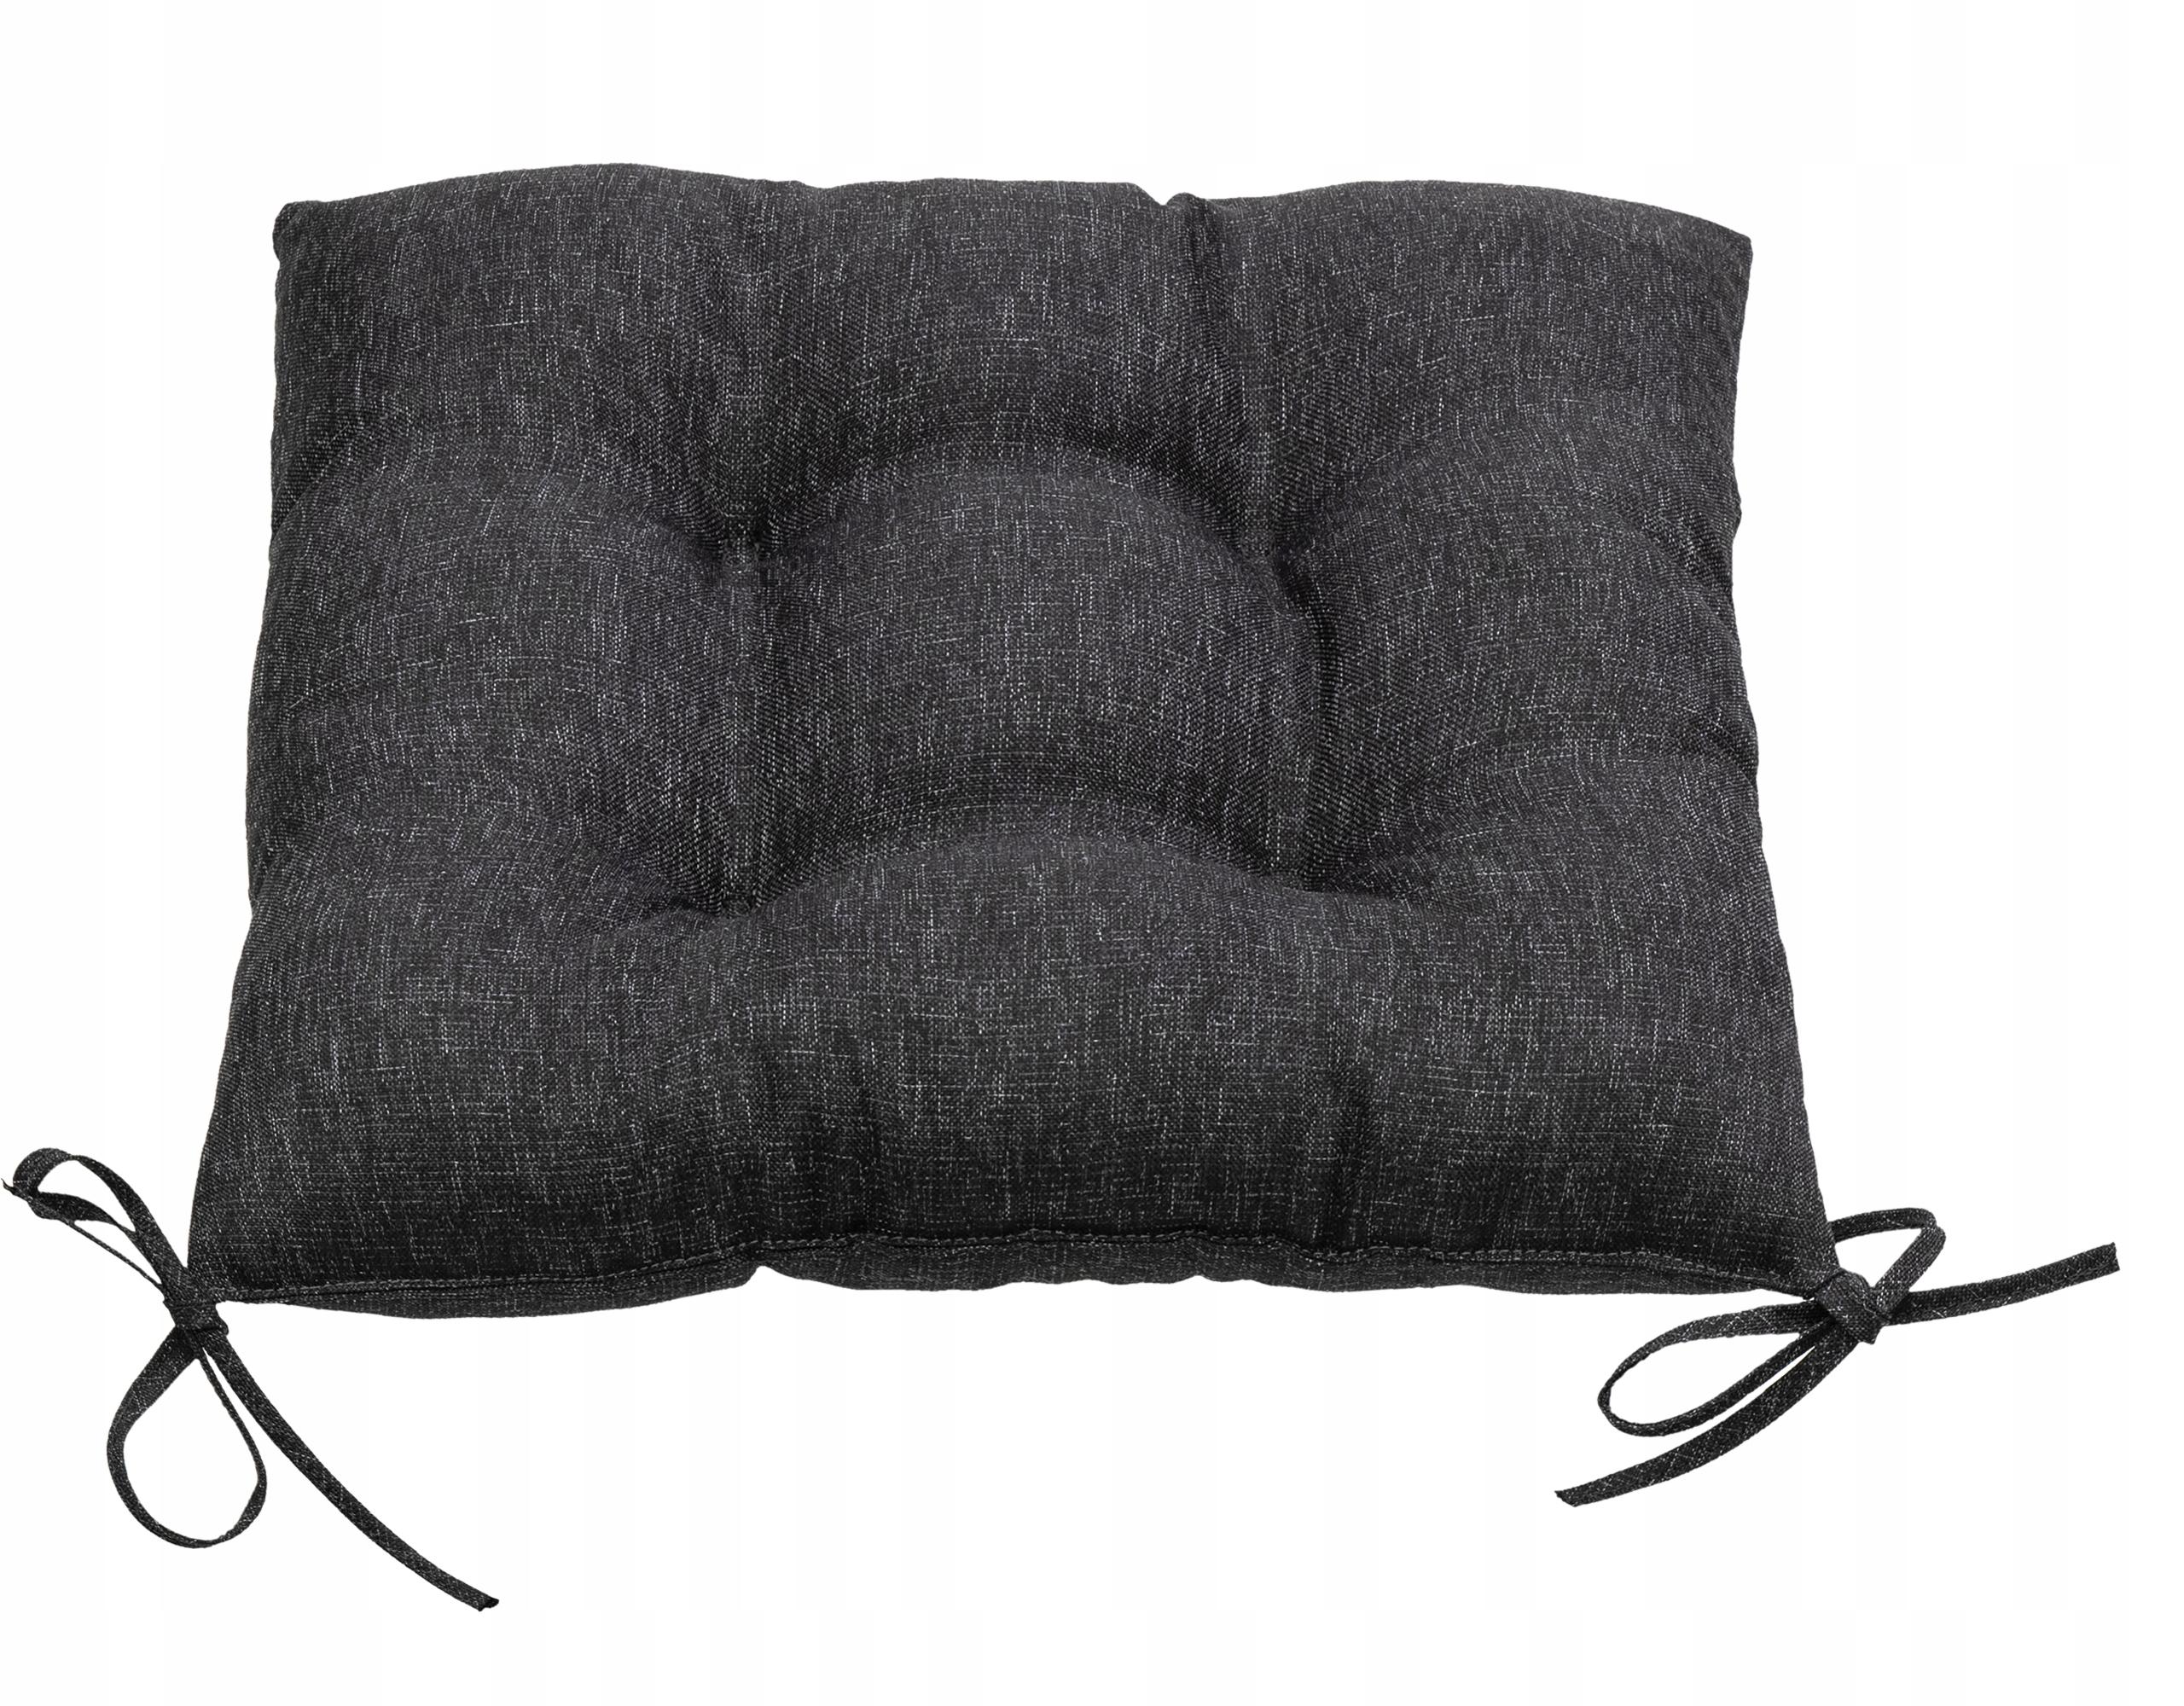 Подушка на стул WATERPROOF 40x40 LEN, лямки